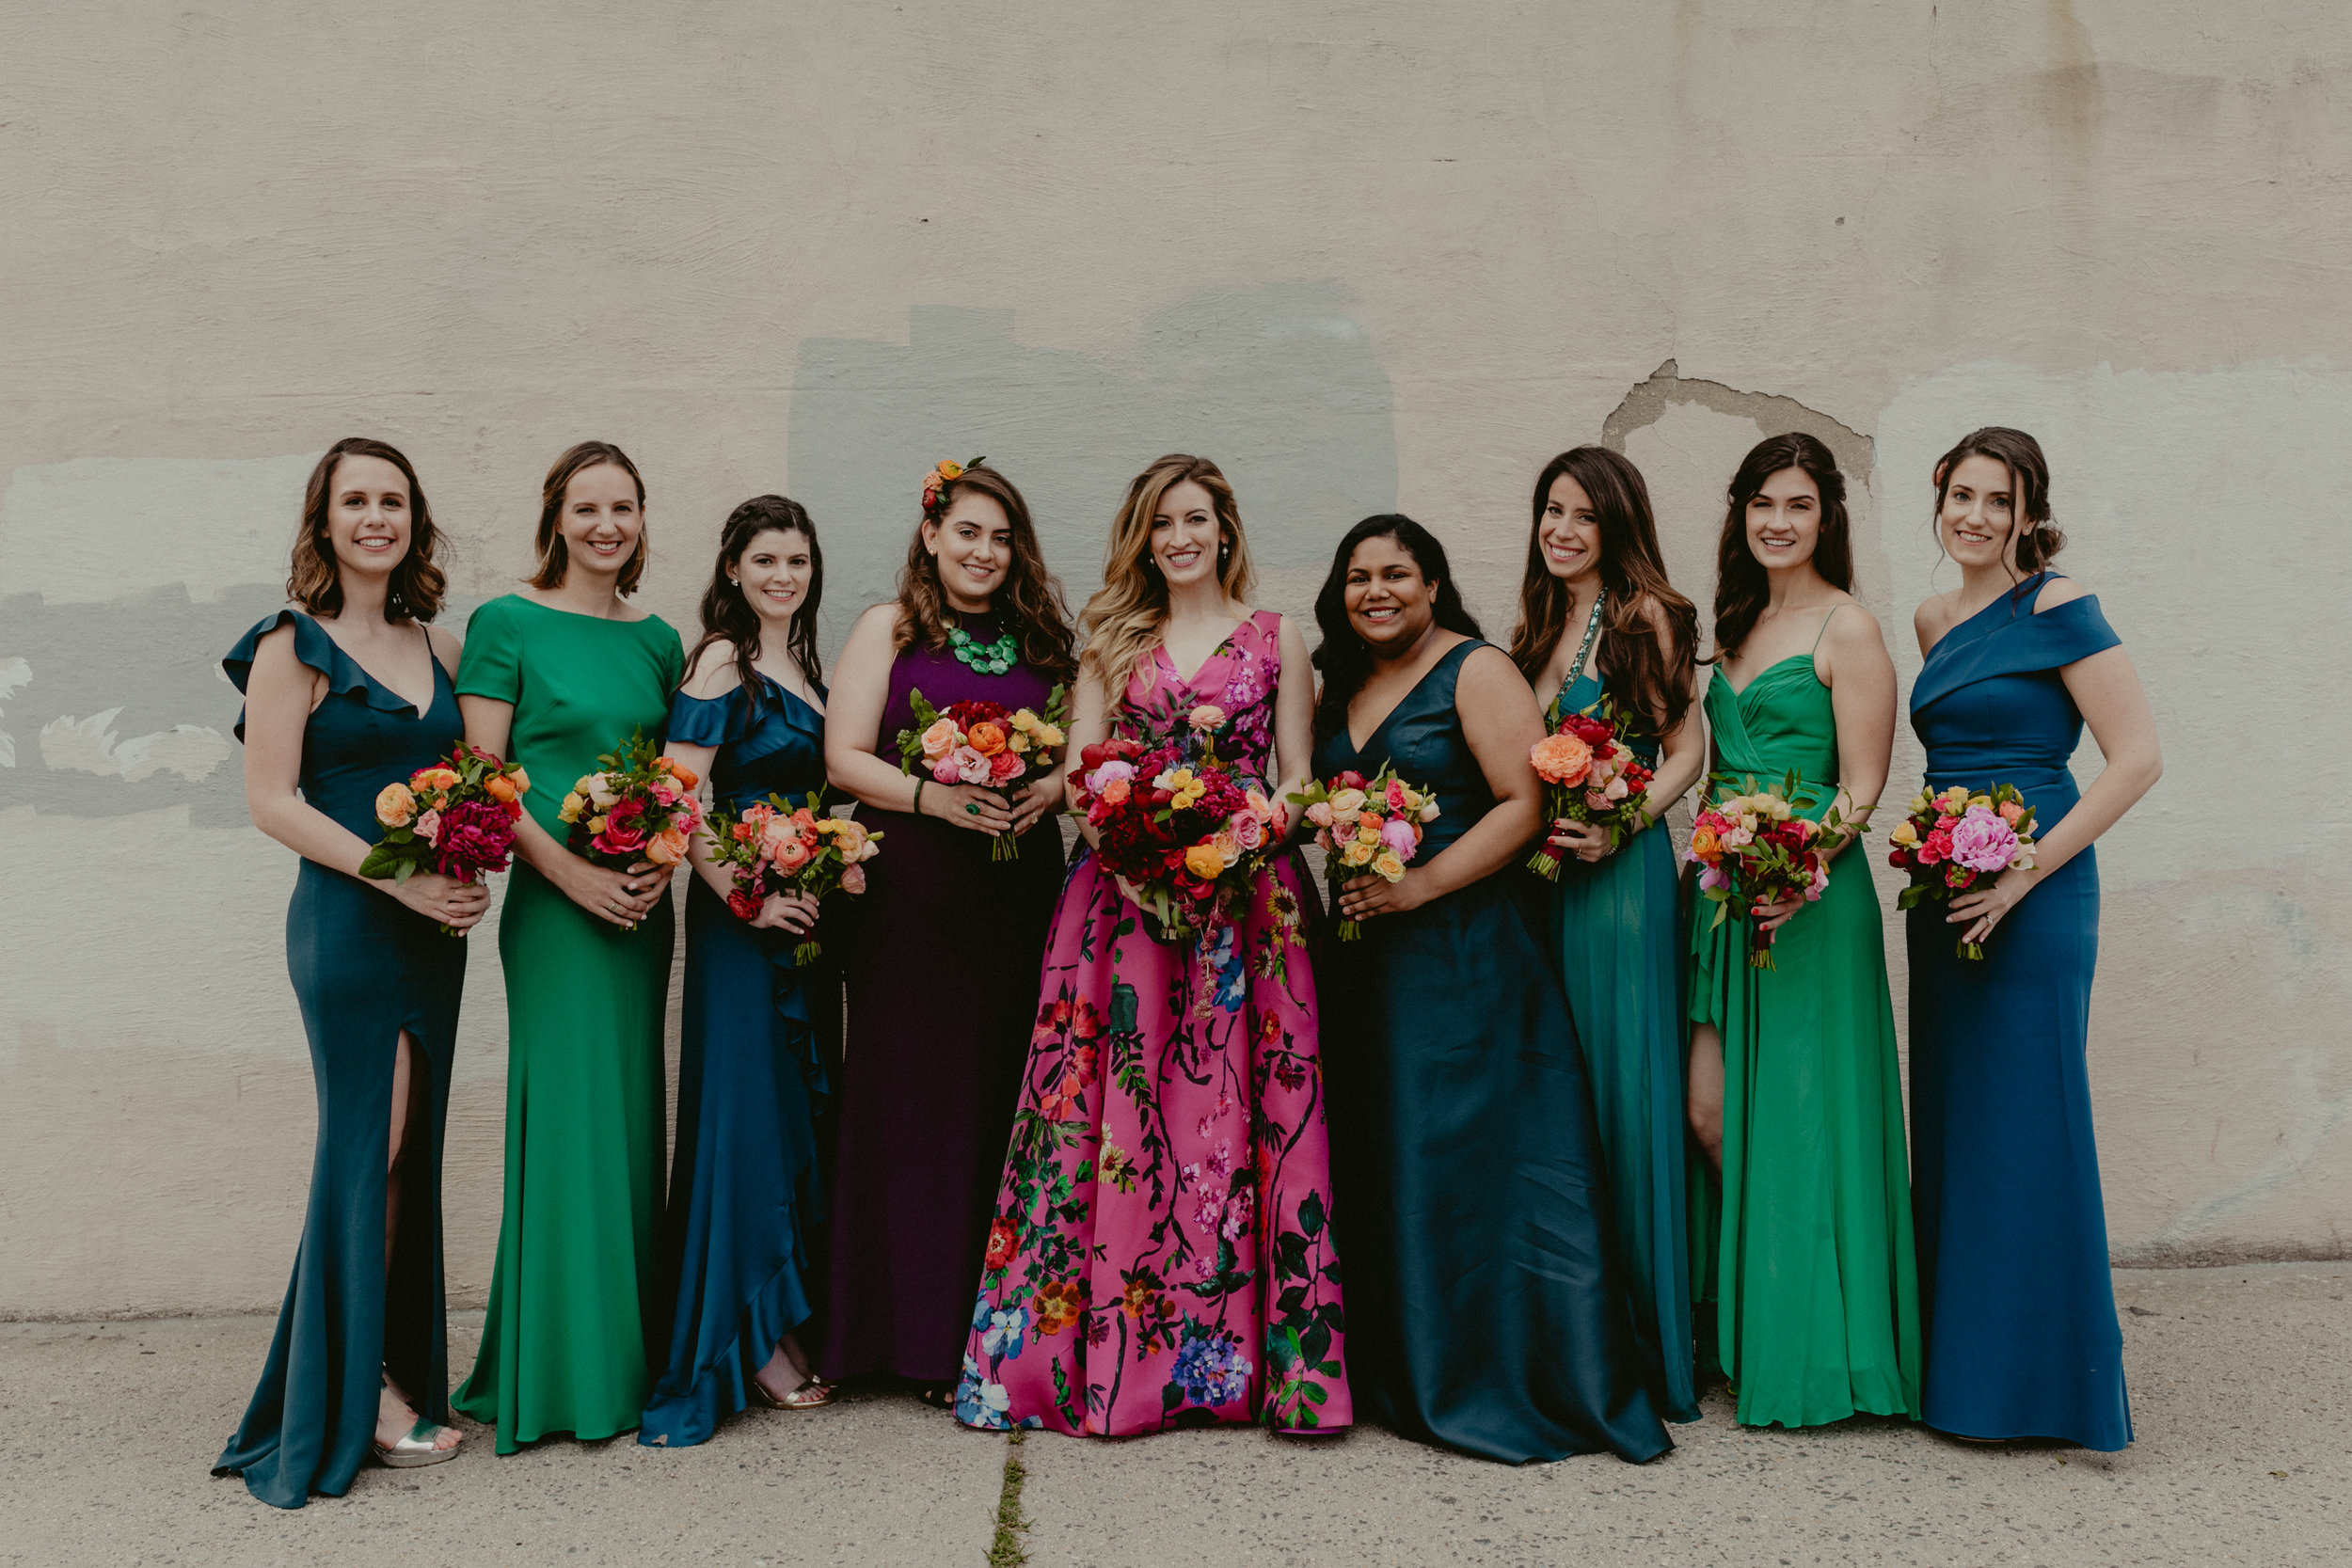 martha stewart weddings - a wardrobe Change for bridesmaids?